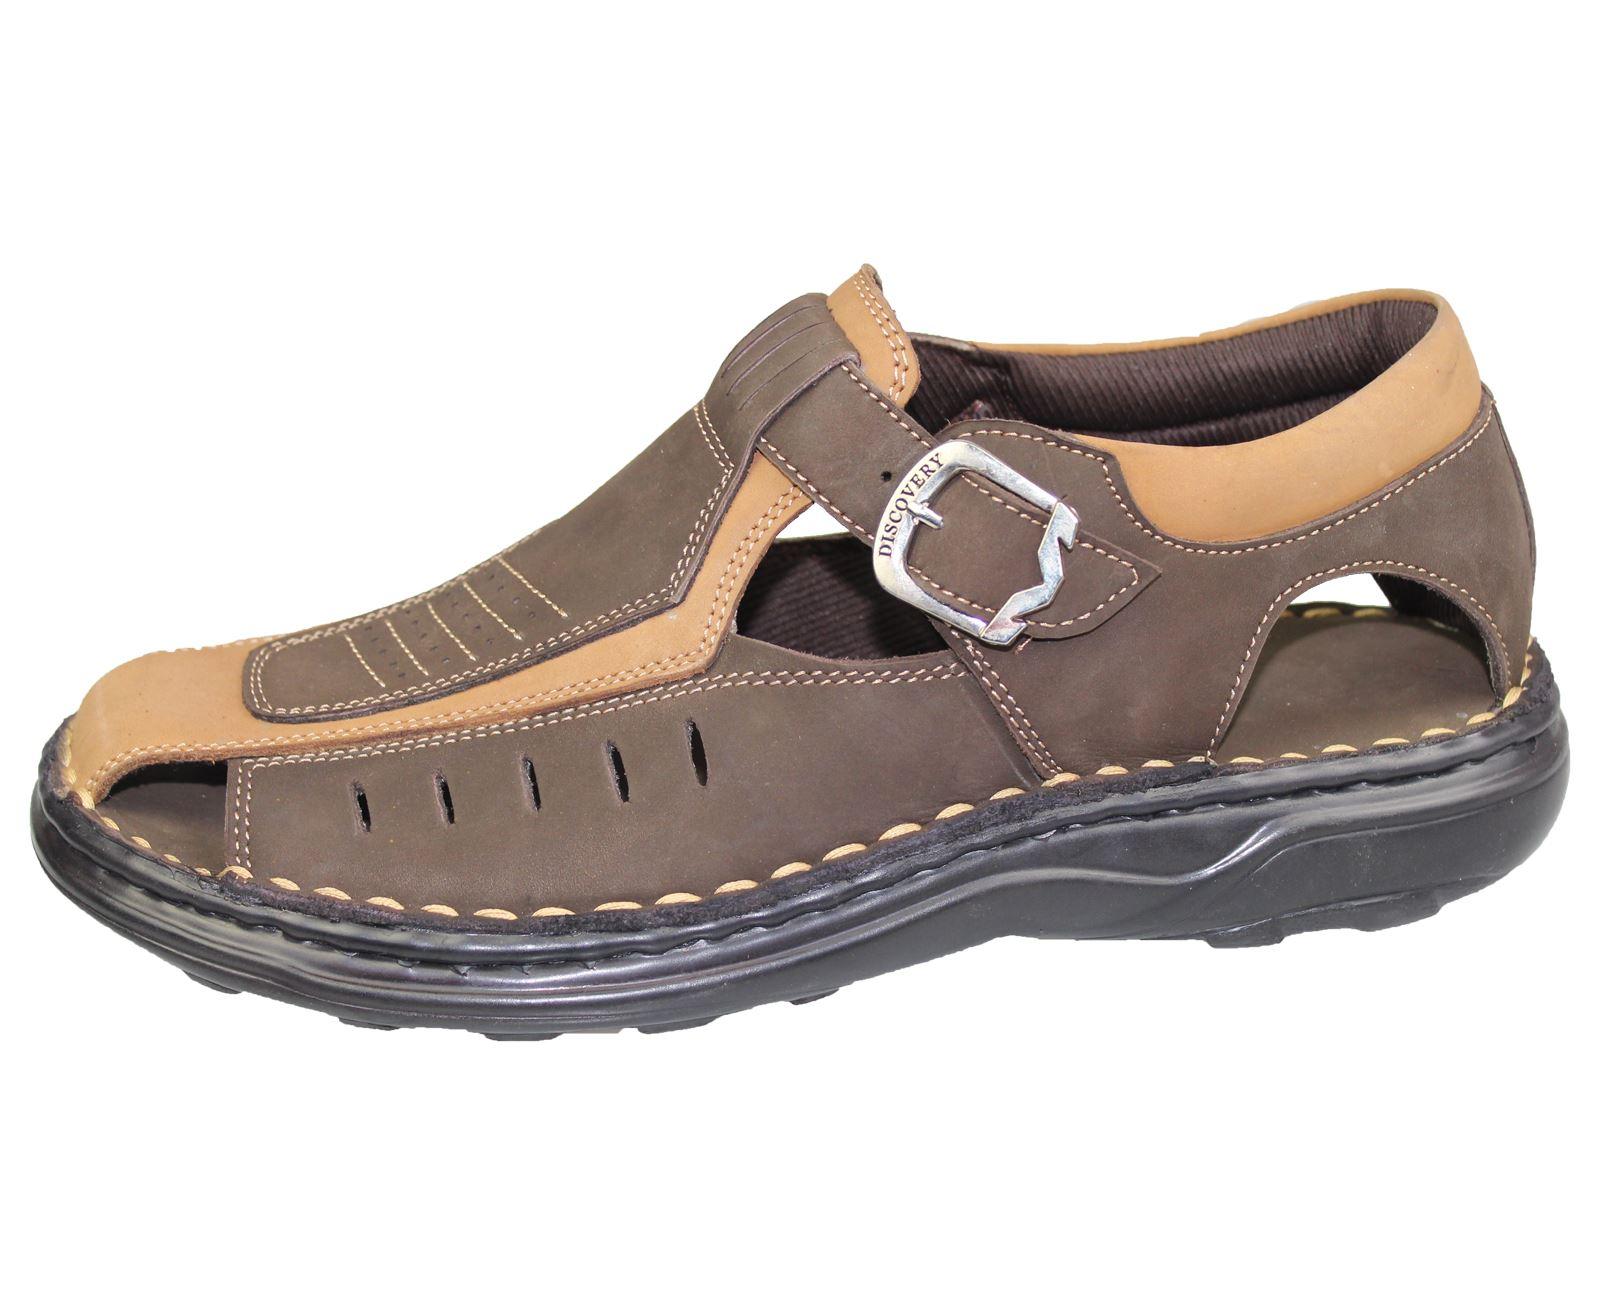 Wide Fit Fashion Sandals Uk